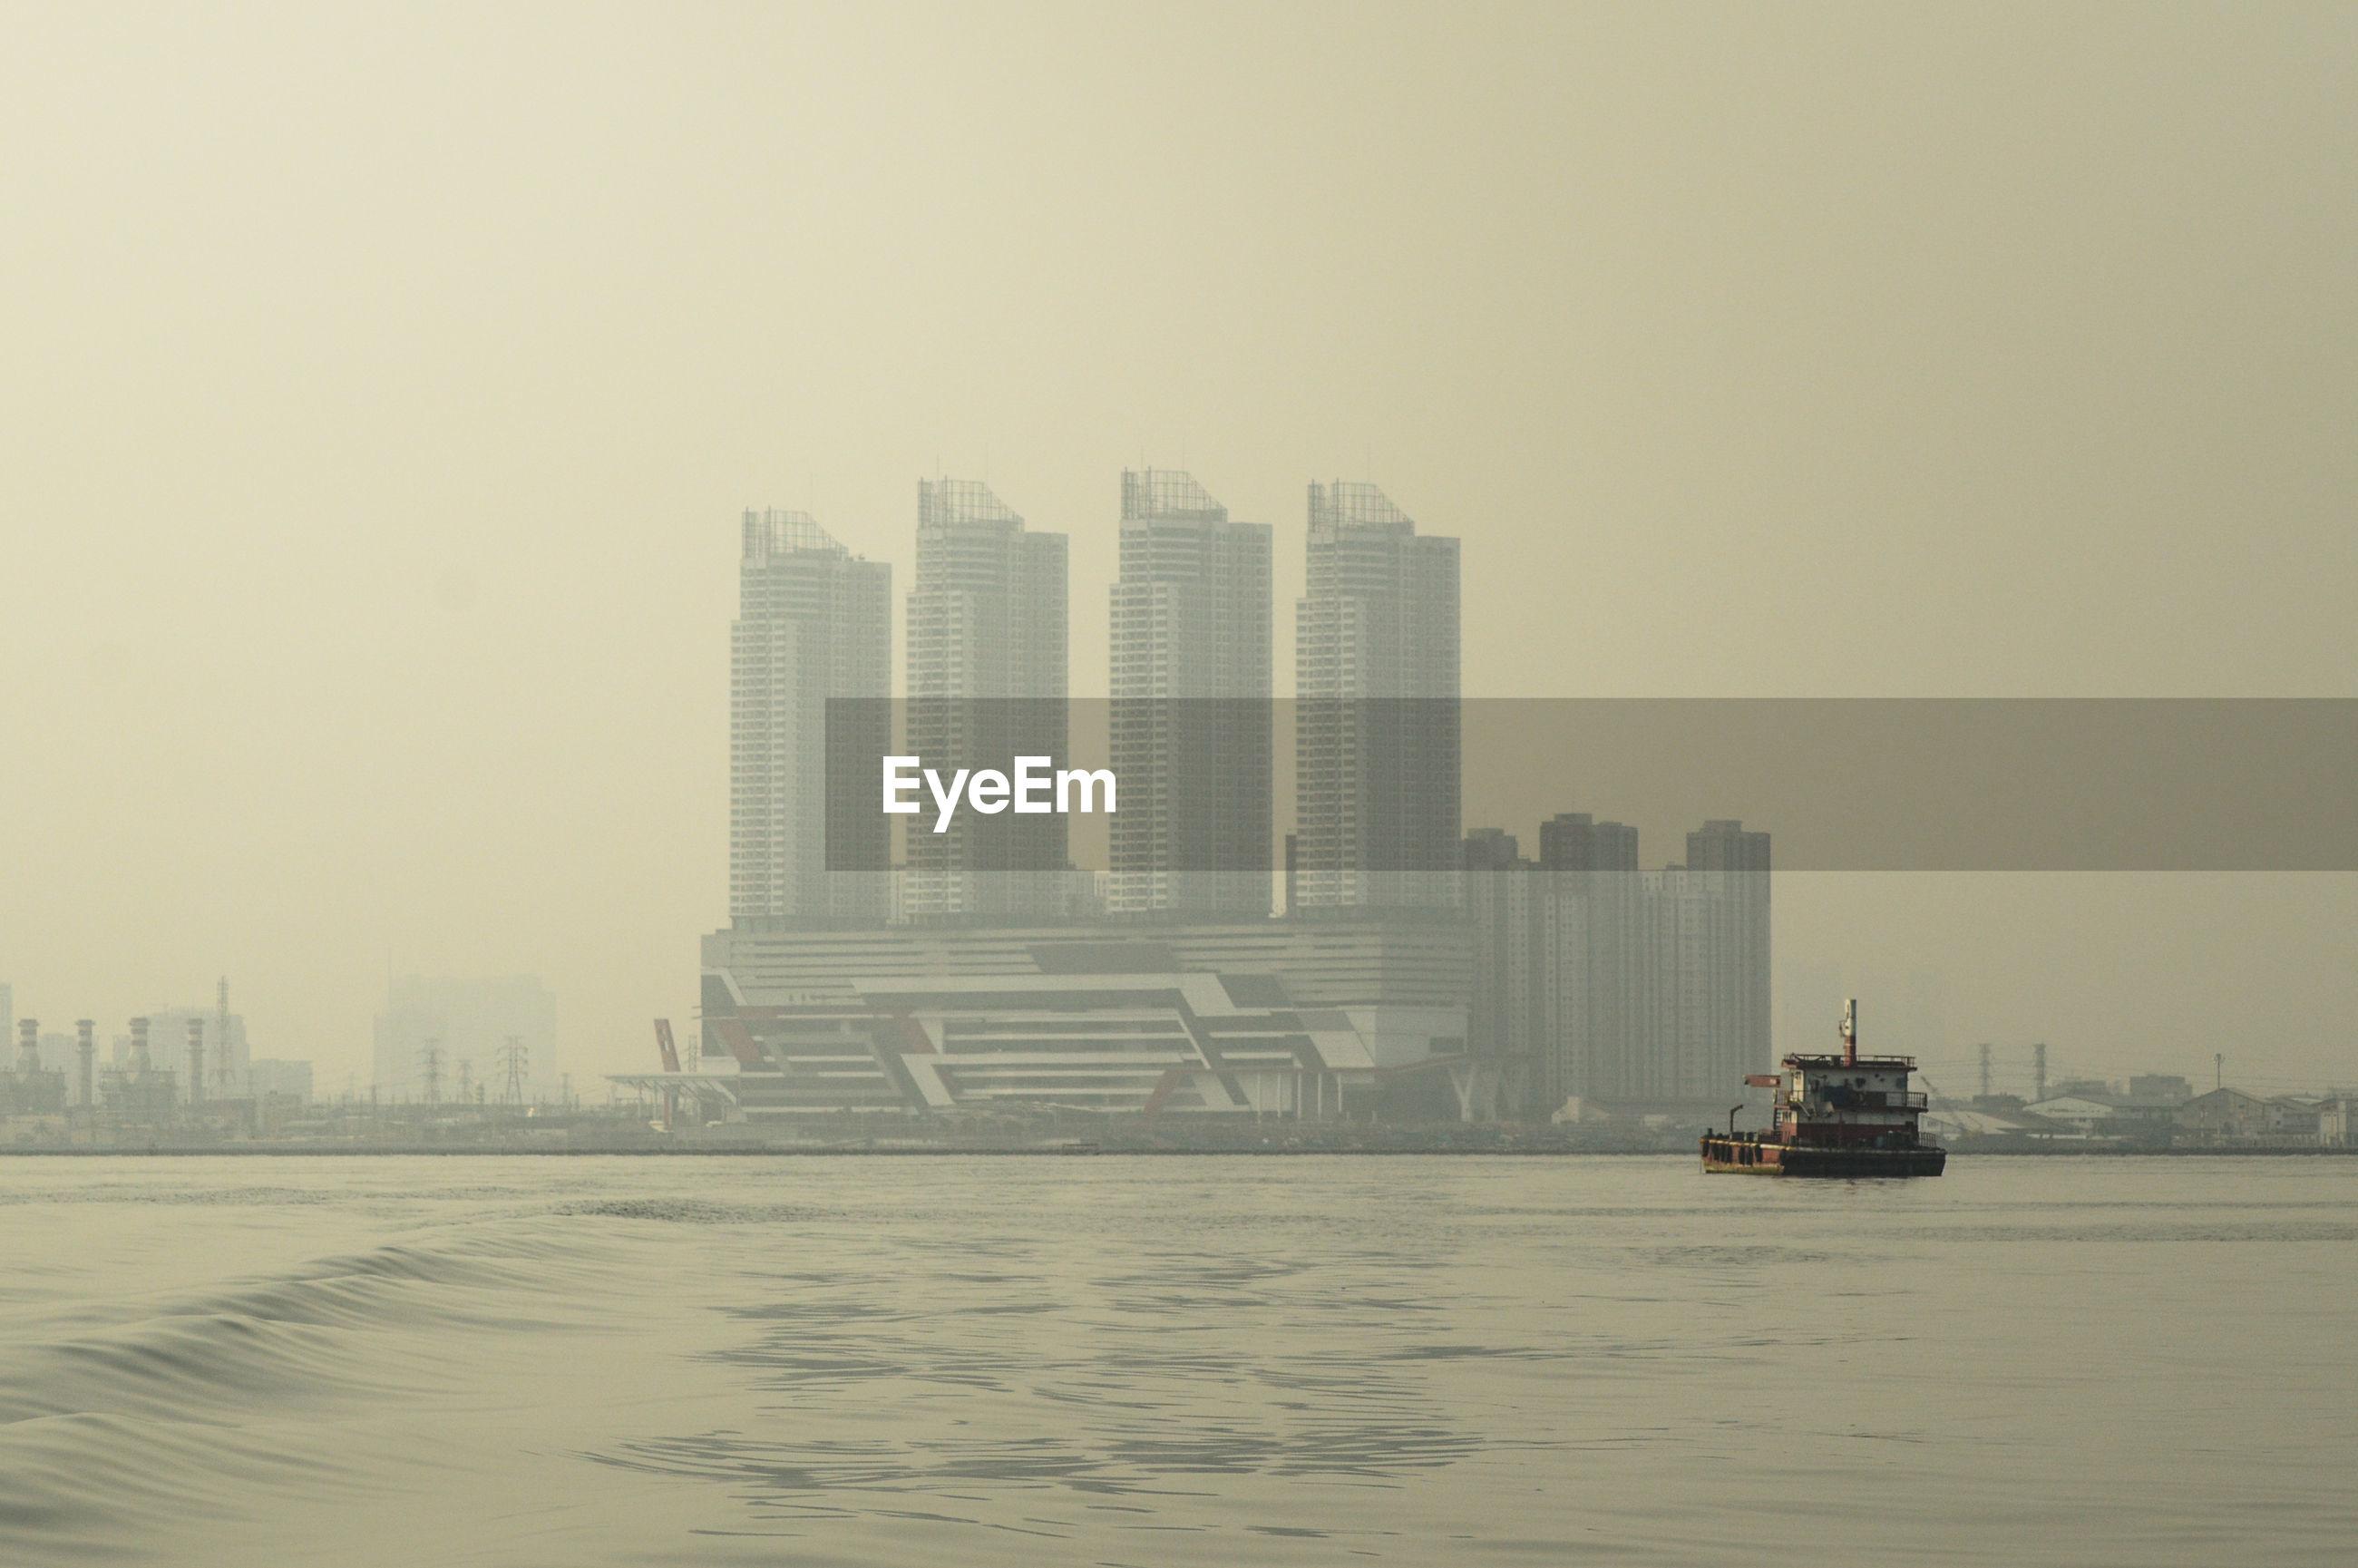 SHIP IN SEA AGAINST BUILDINGS IN CITY